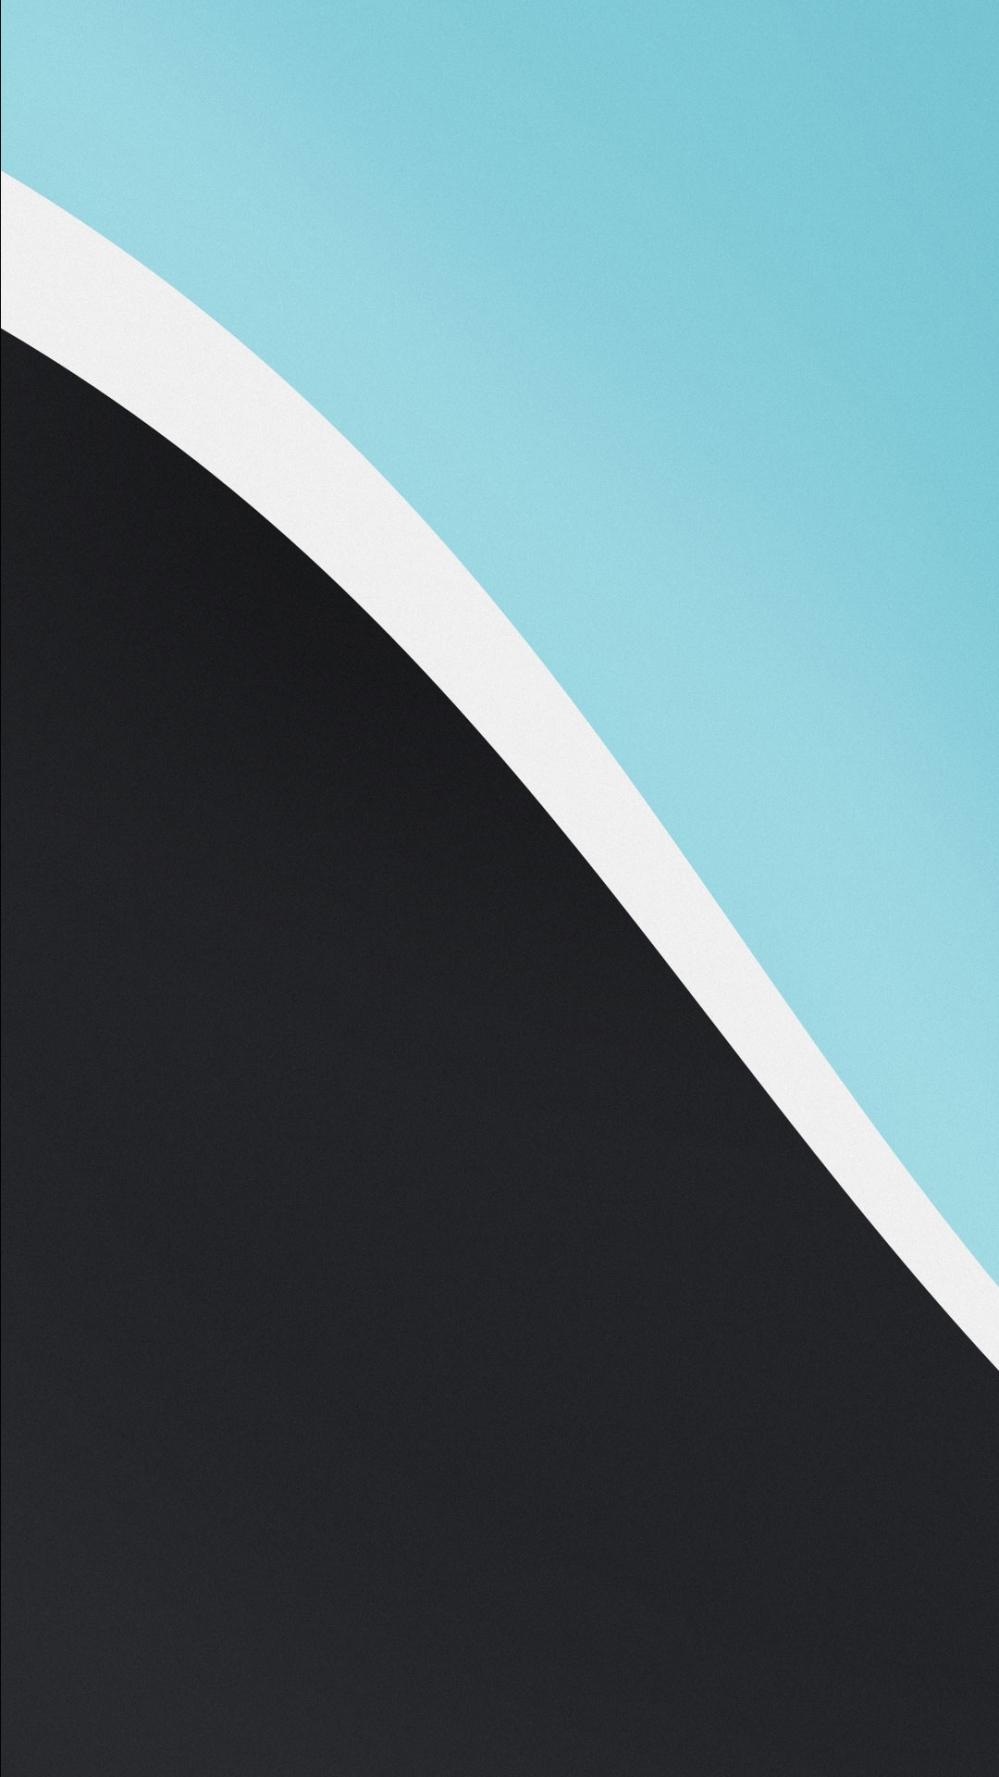 wallpapers_b_03